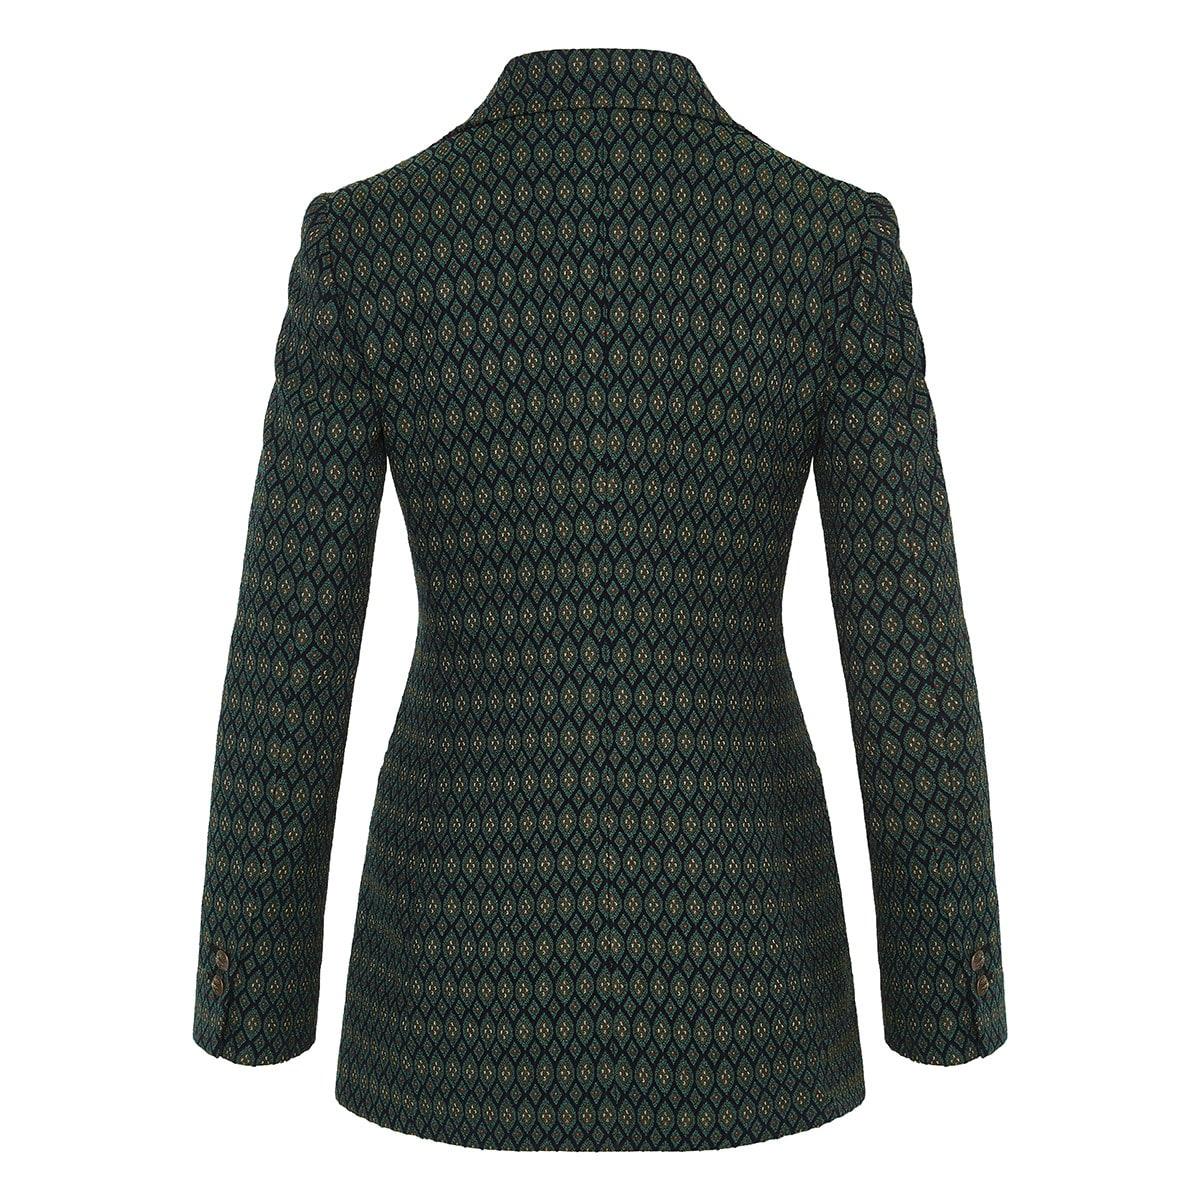 Geometric patterned jacquard blazer